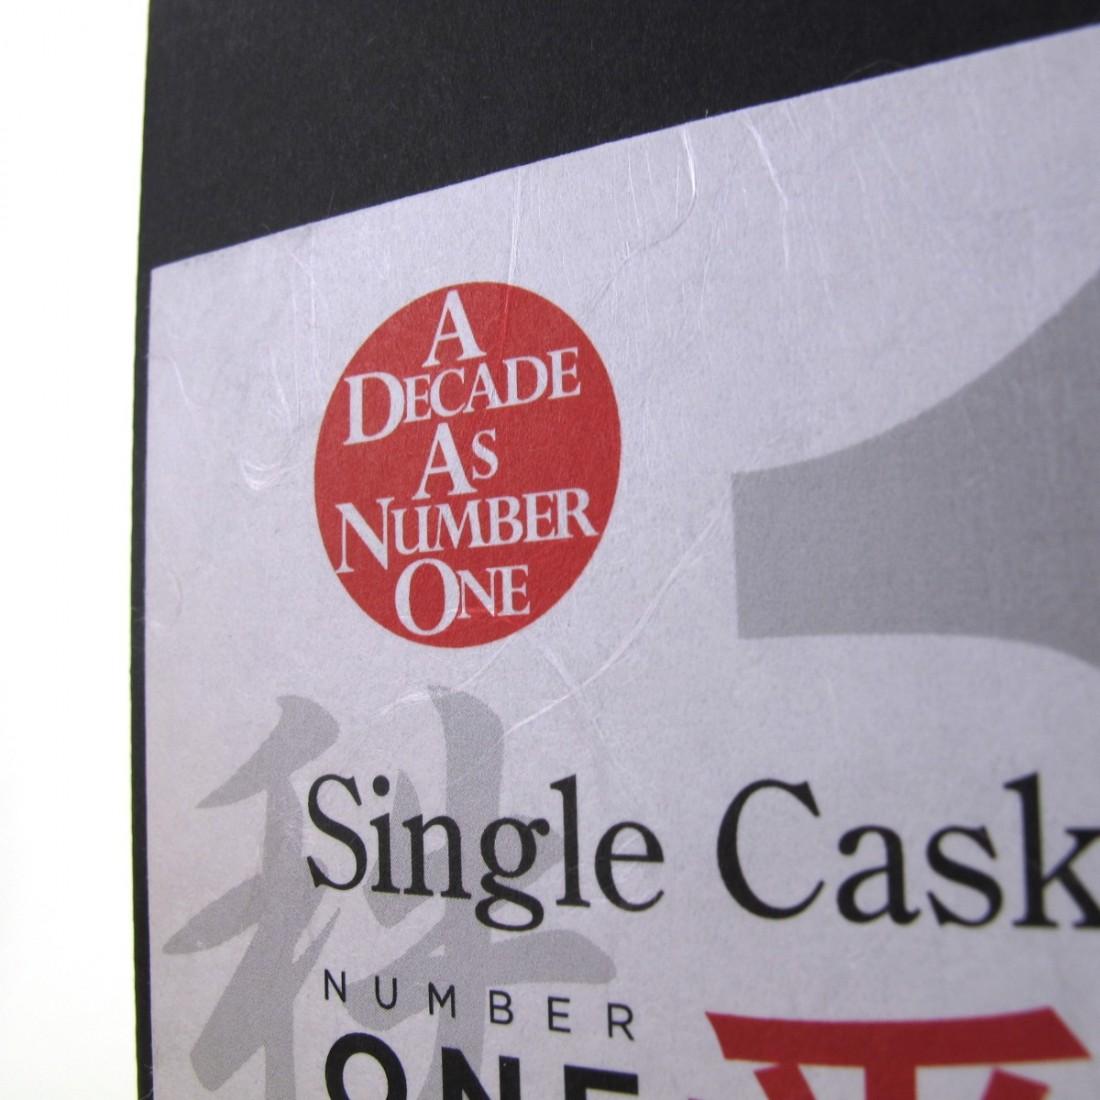 Chichibu 2009 Ichiro's Malt Single Cask #635 / A Decade as Number One